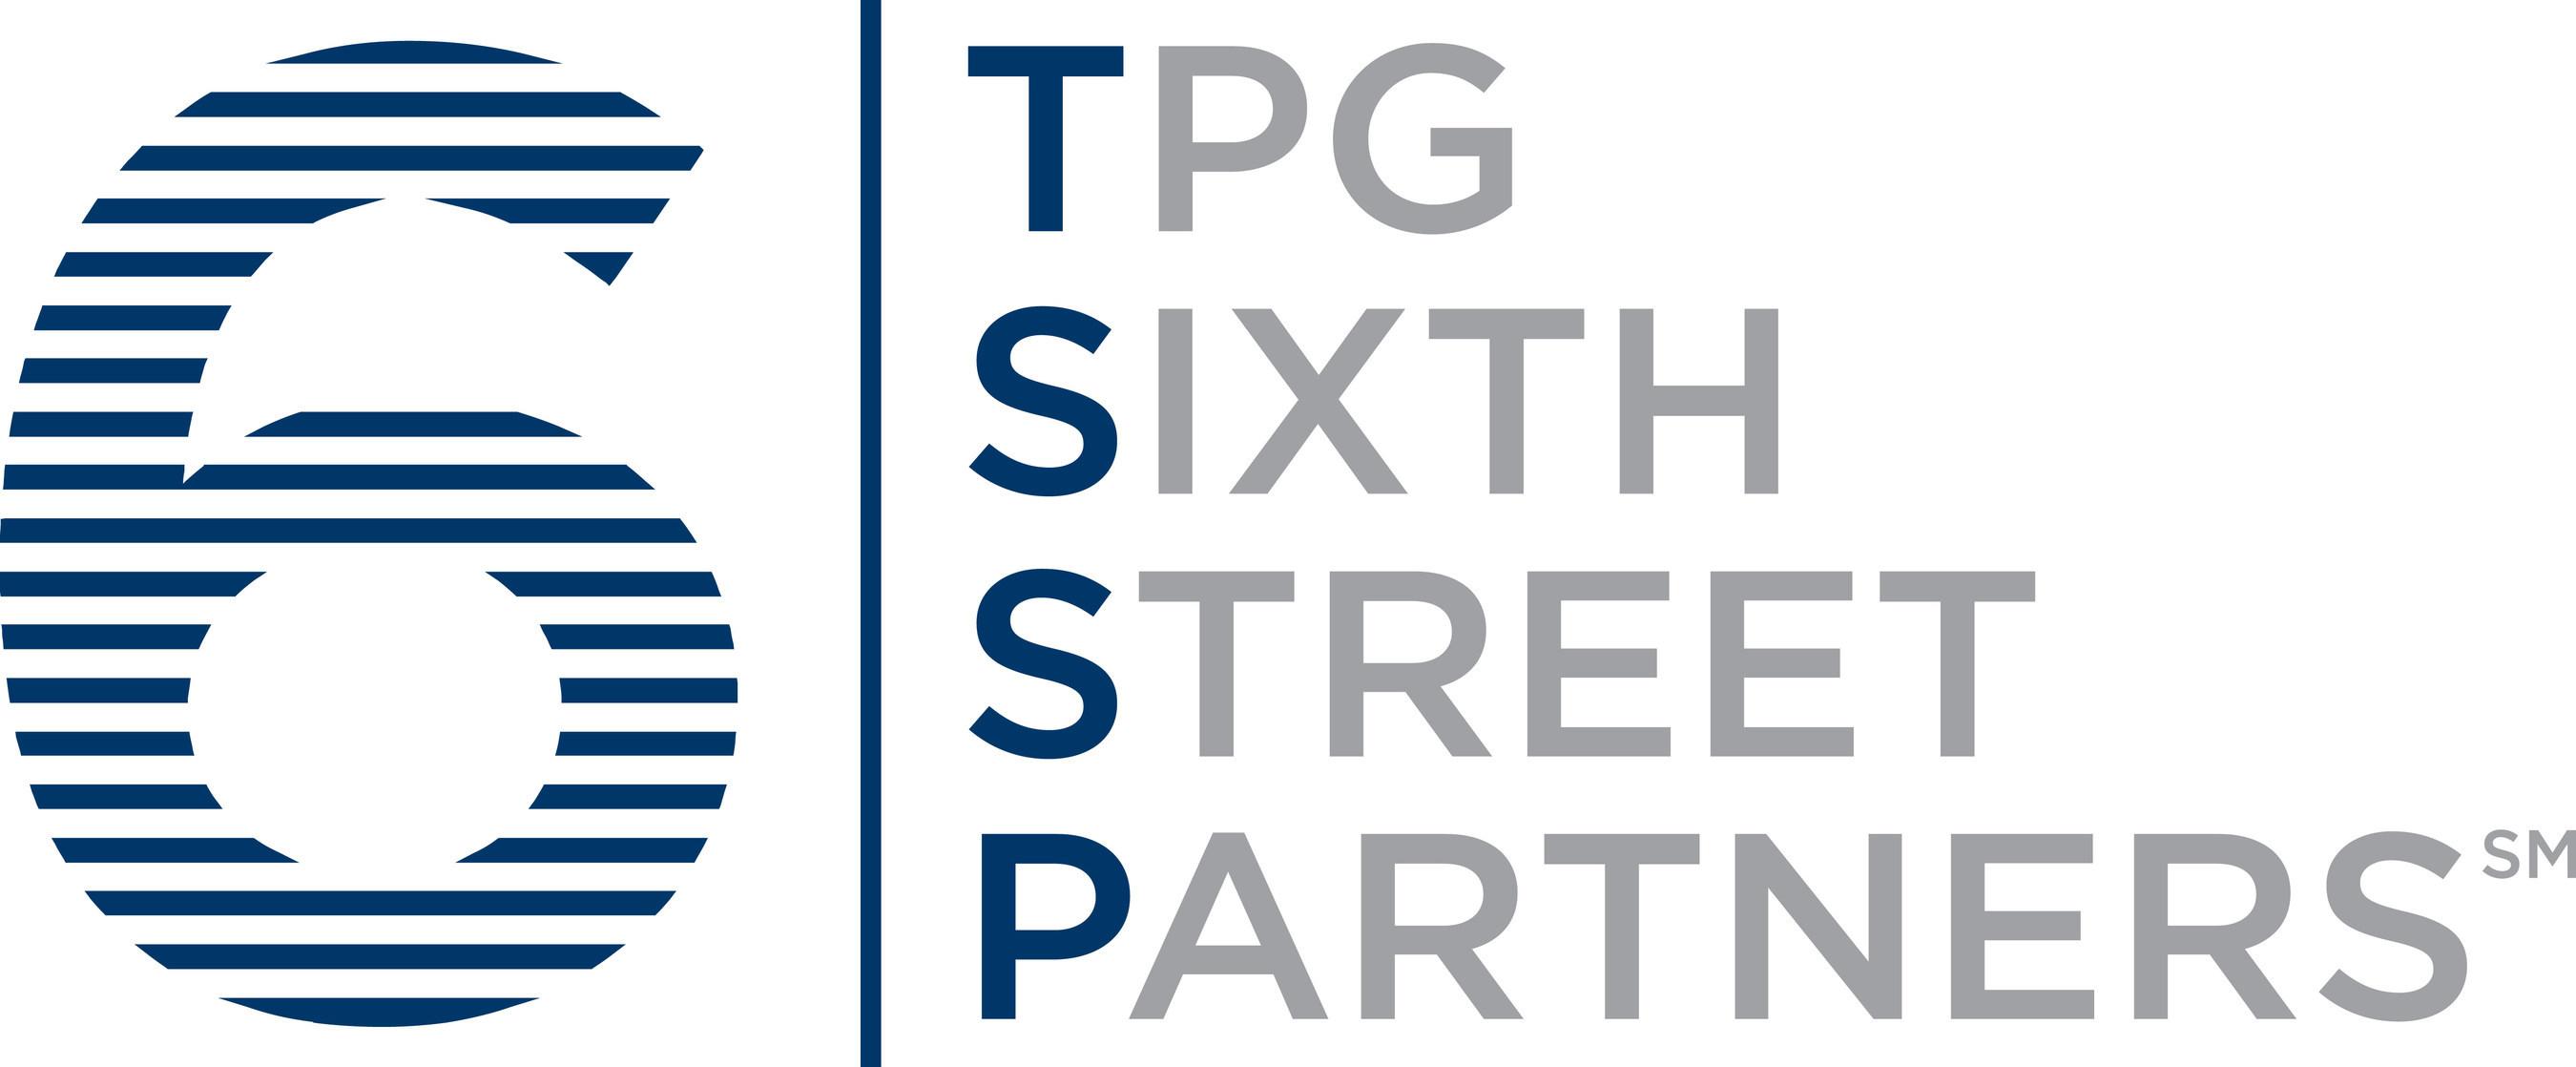 TPG Sixth Street Partners (TSSP) Announces Completion of Strategic